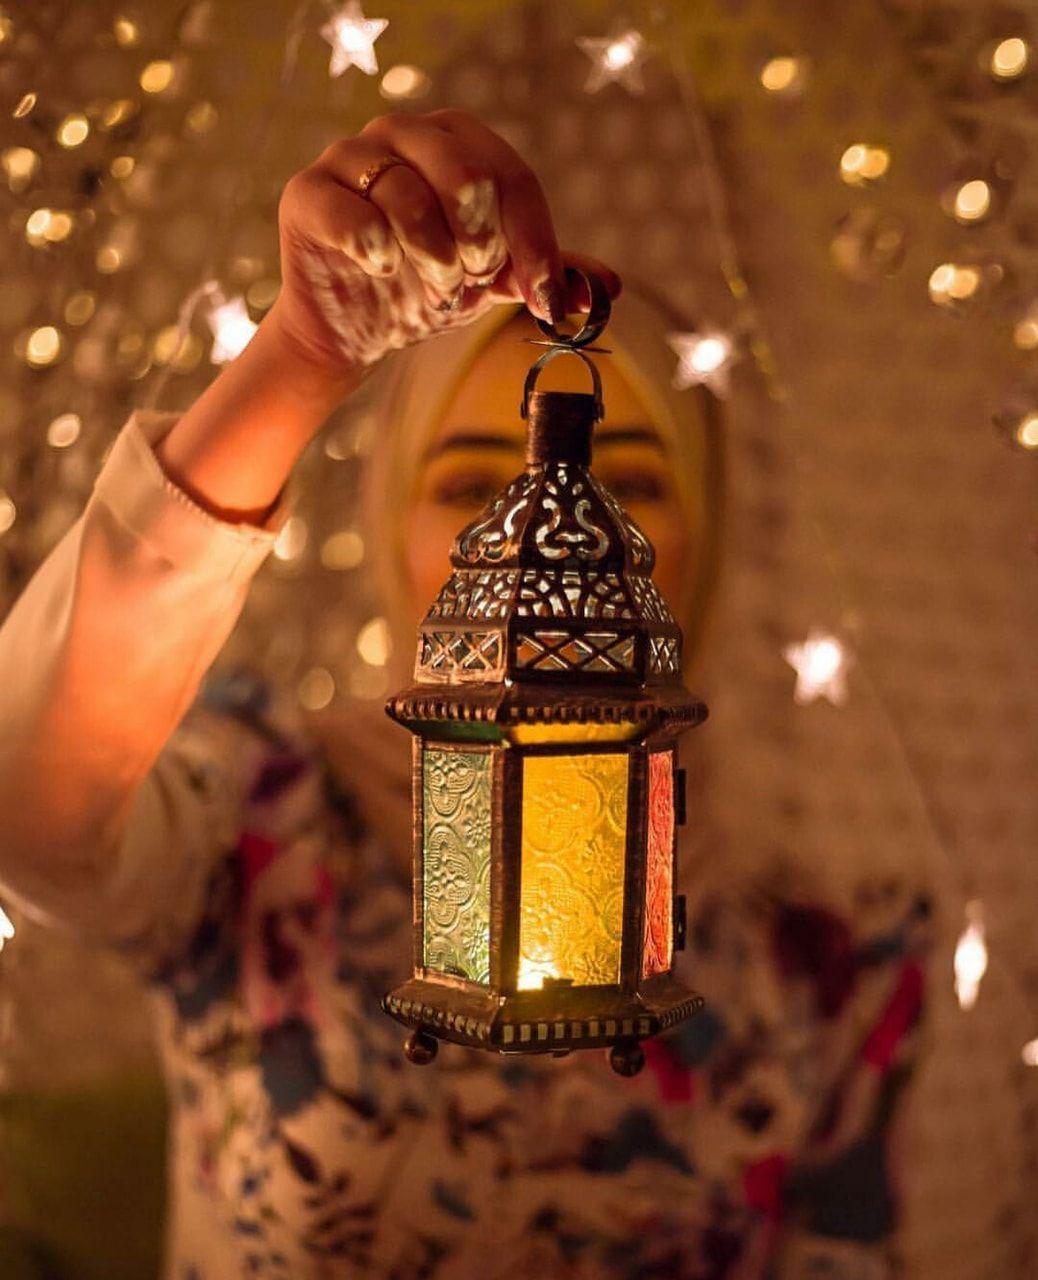 Uploaded By Hazel Find Images And Videos About ر م ض ان فانوس And Ramadan Karim On We Heart It The A Ramadan Lantern Ramadan Kareem Decoration Islamic Girl